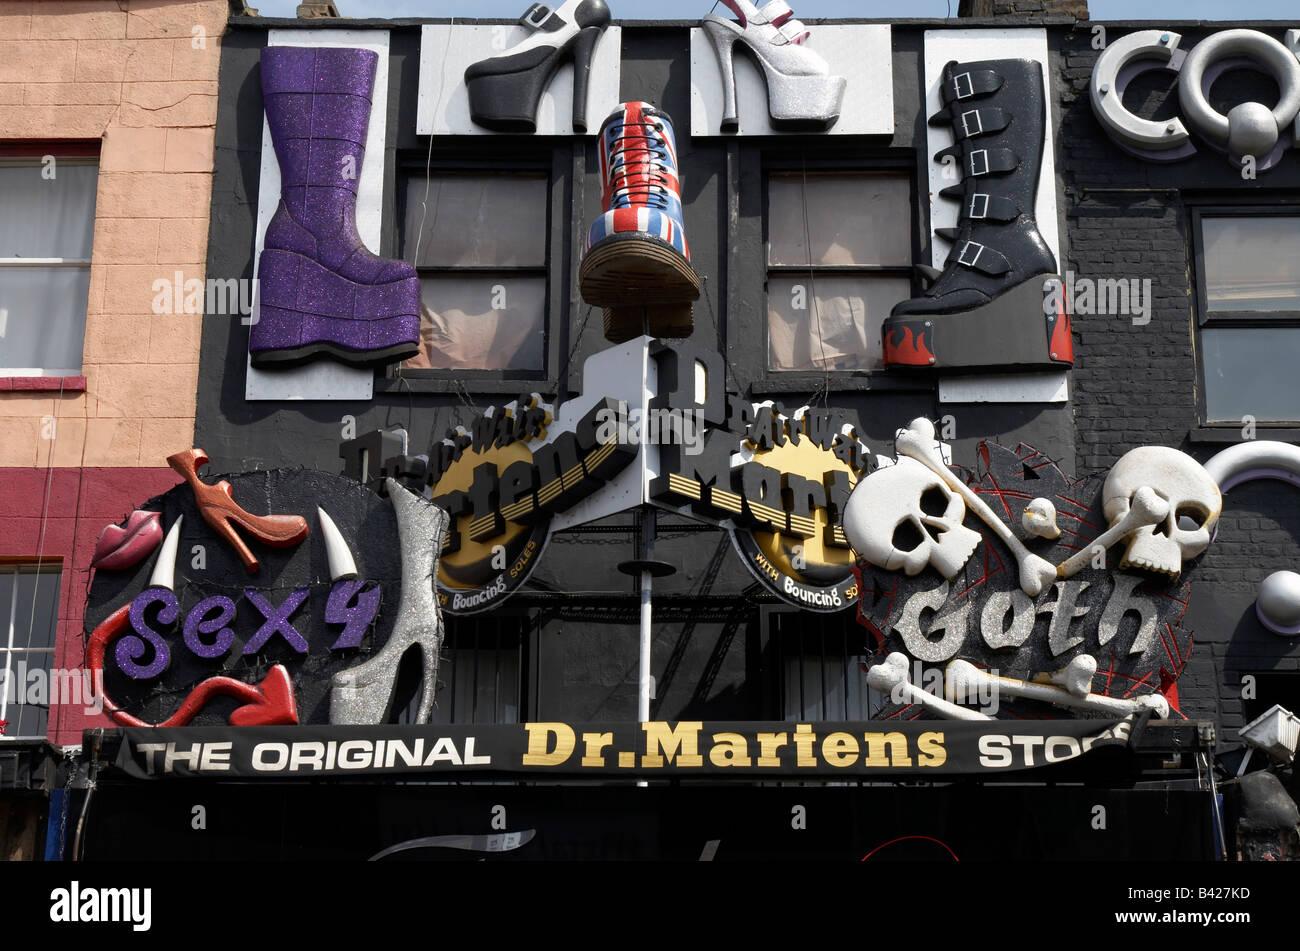 Dr martens in union jack camden high street camden town nw1 stock - Dr Martens Shop In Camden London Stock Photo Royalty